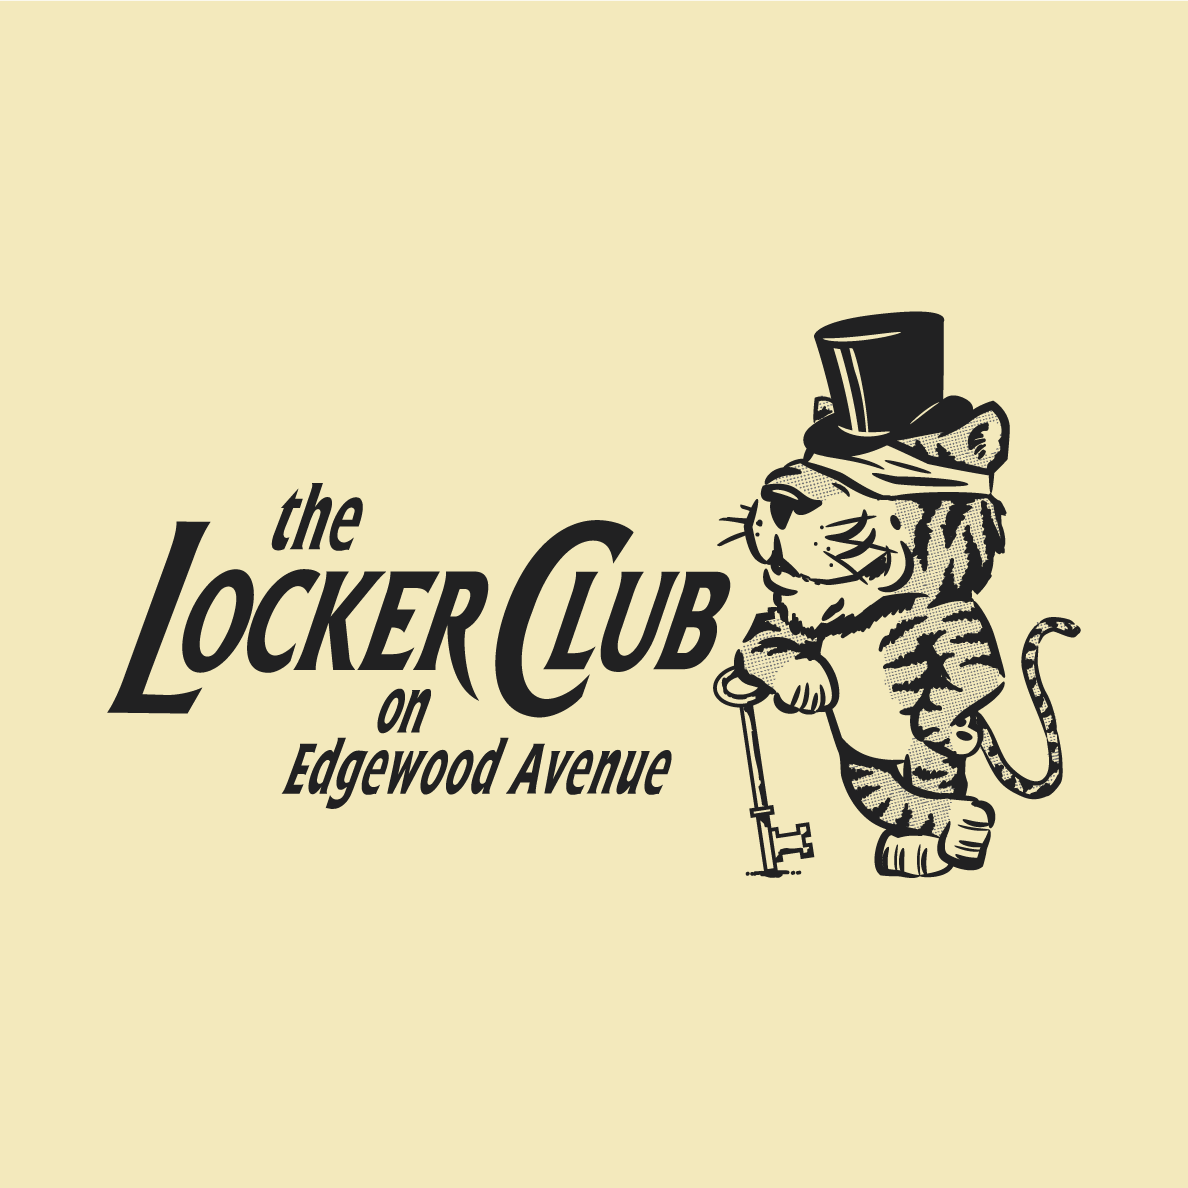 THE LOCKER CLUB - Coming Soon...